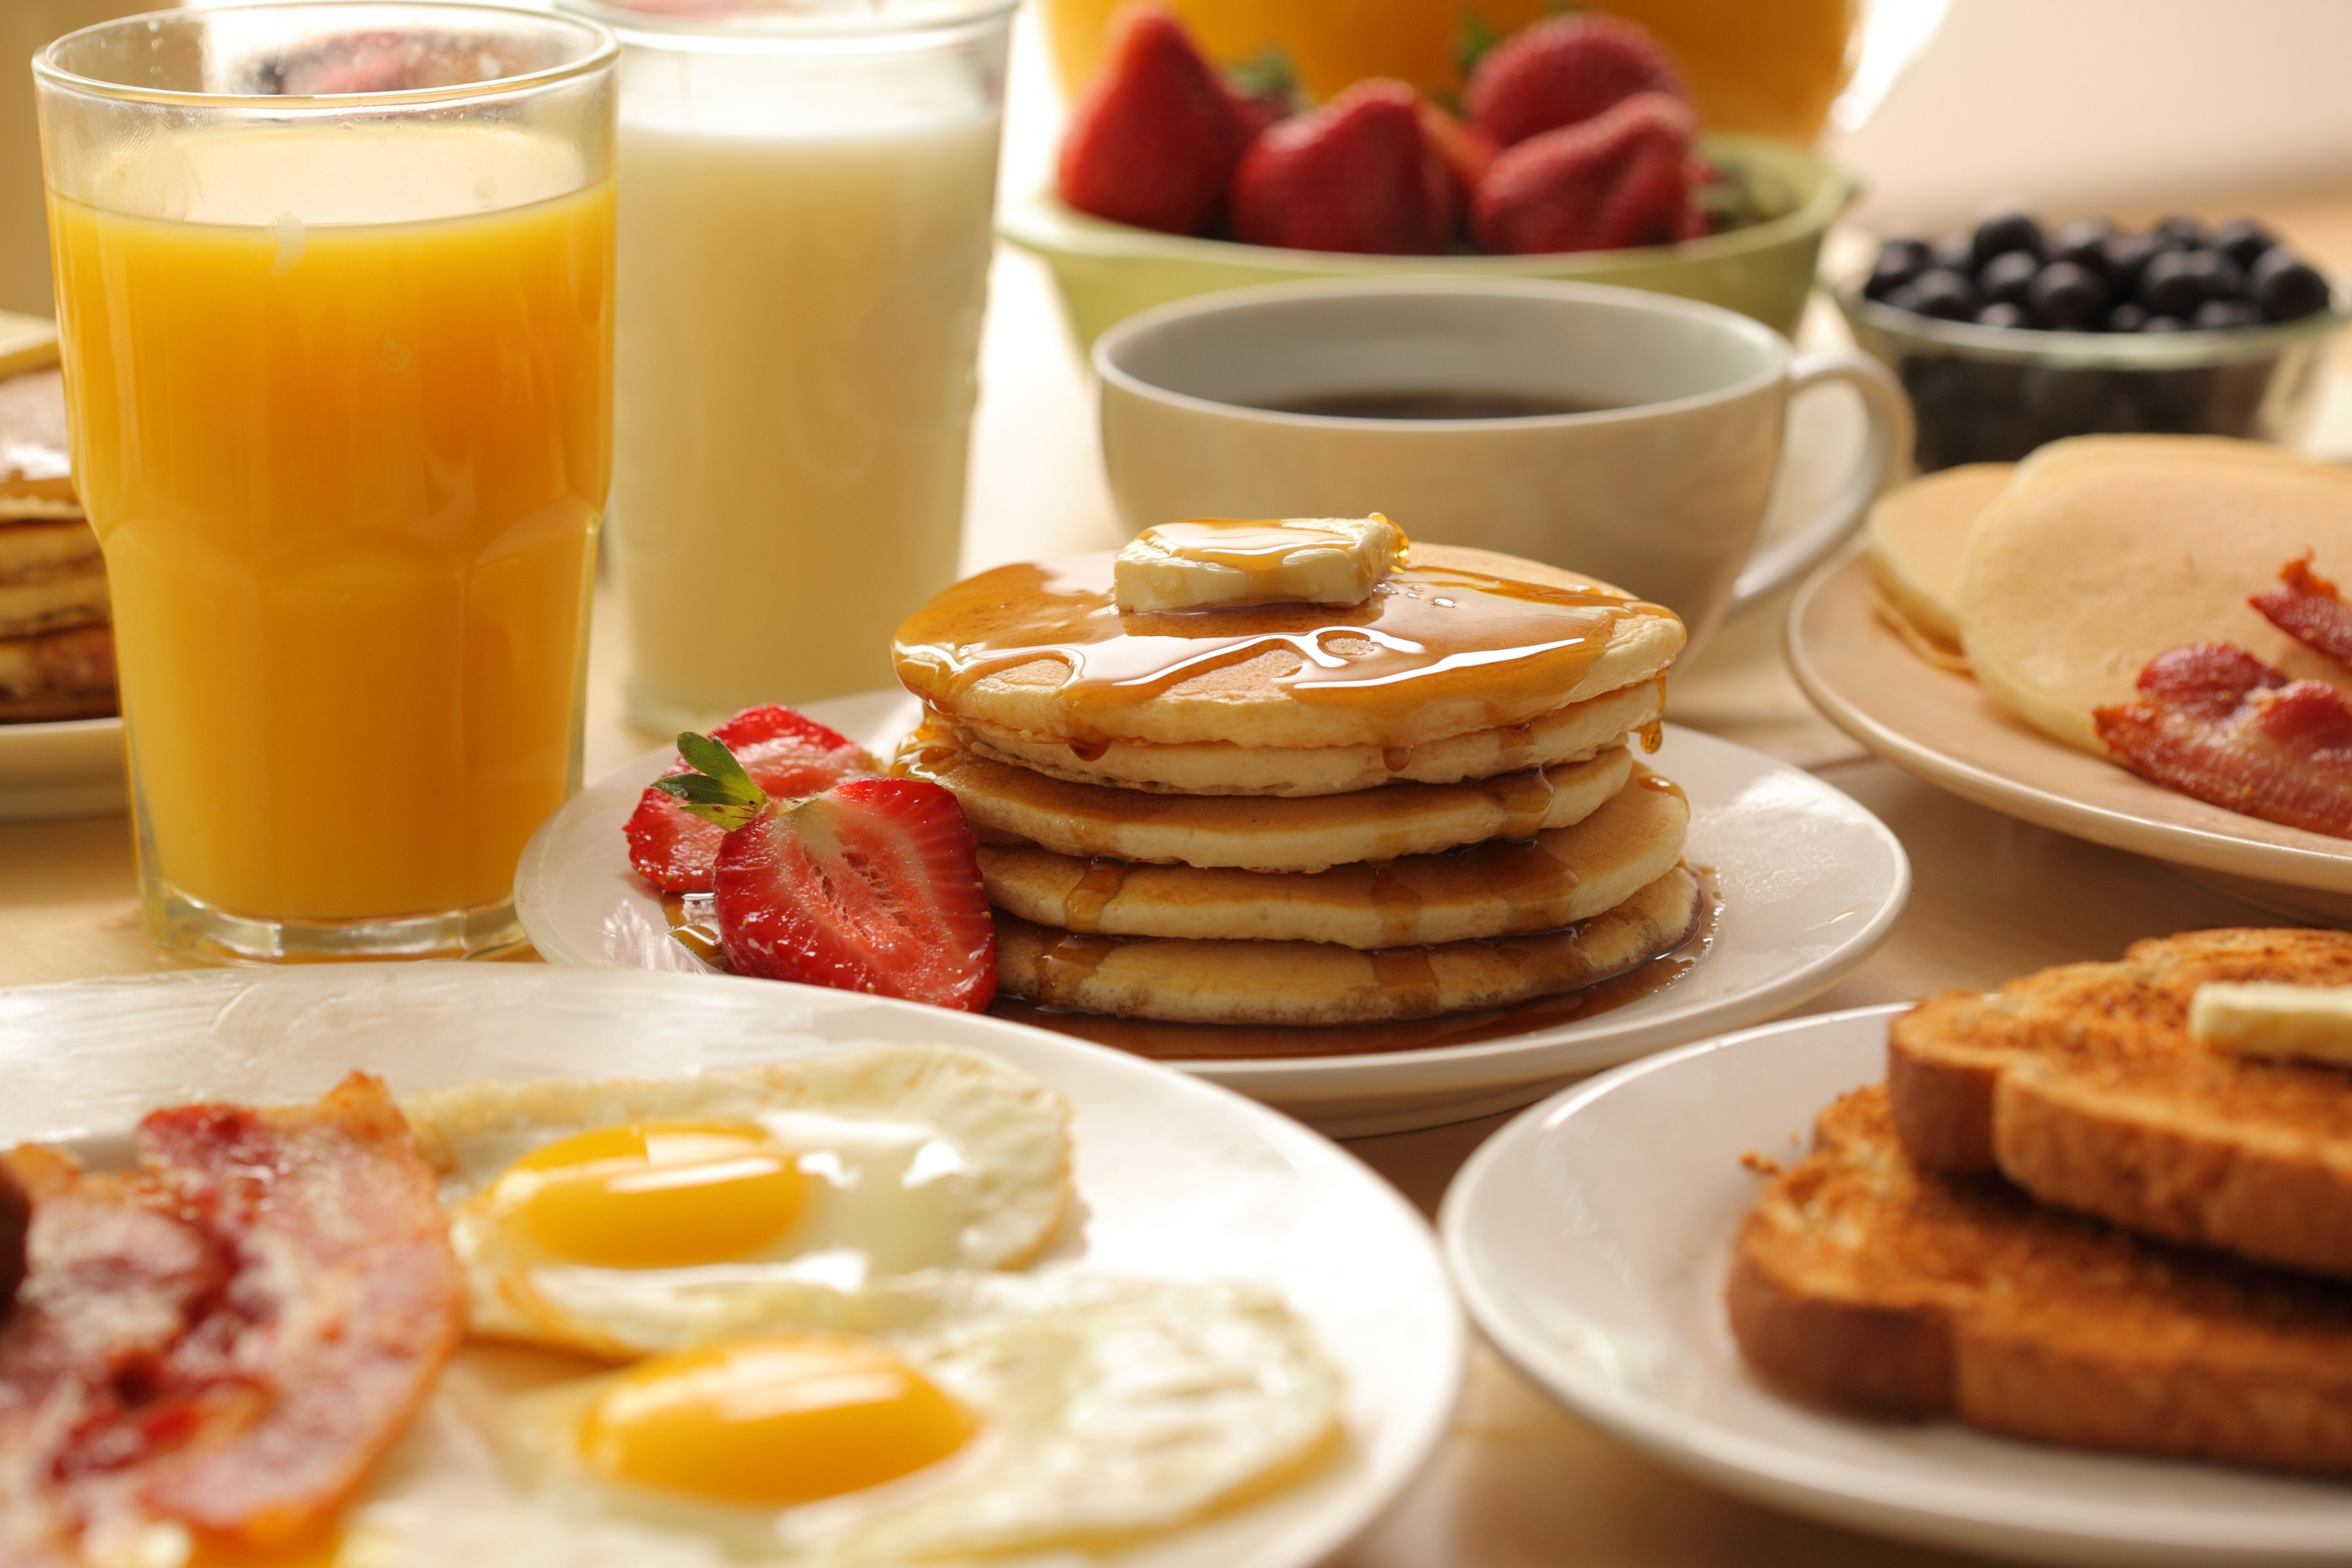 bigstock-Breakfast-foods-14088398.jpg